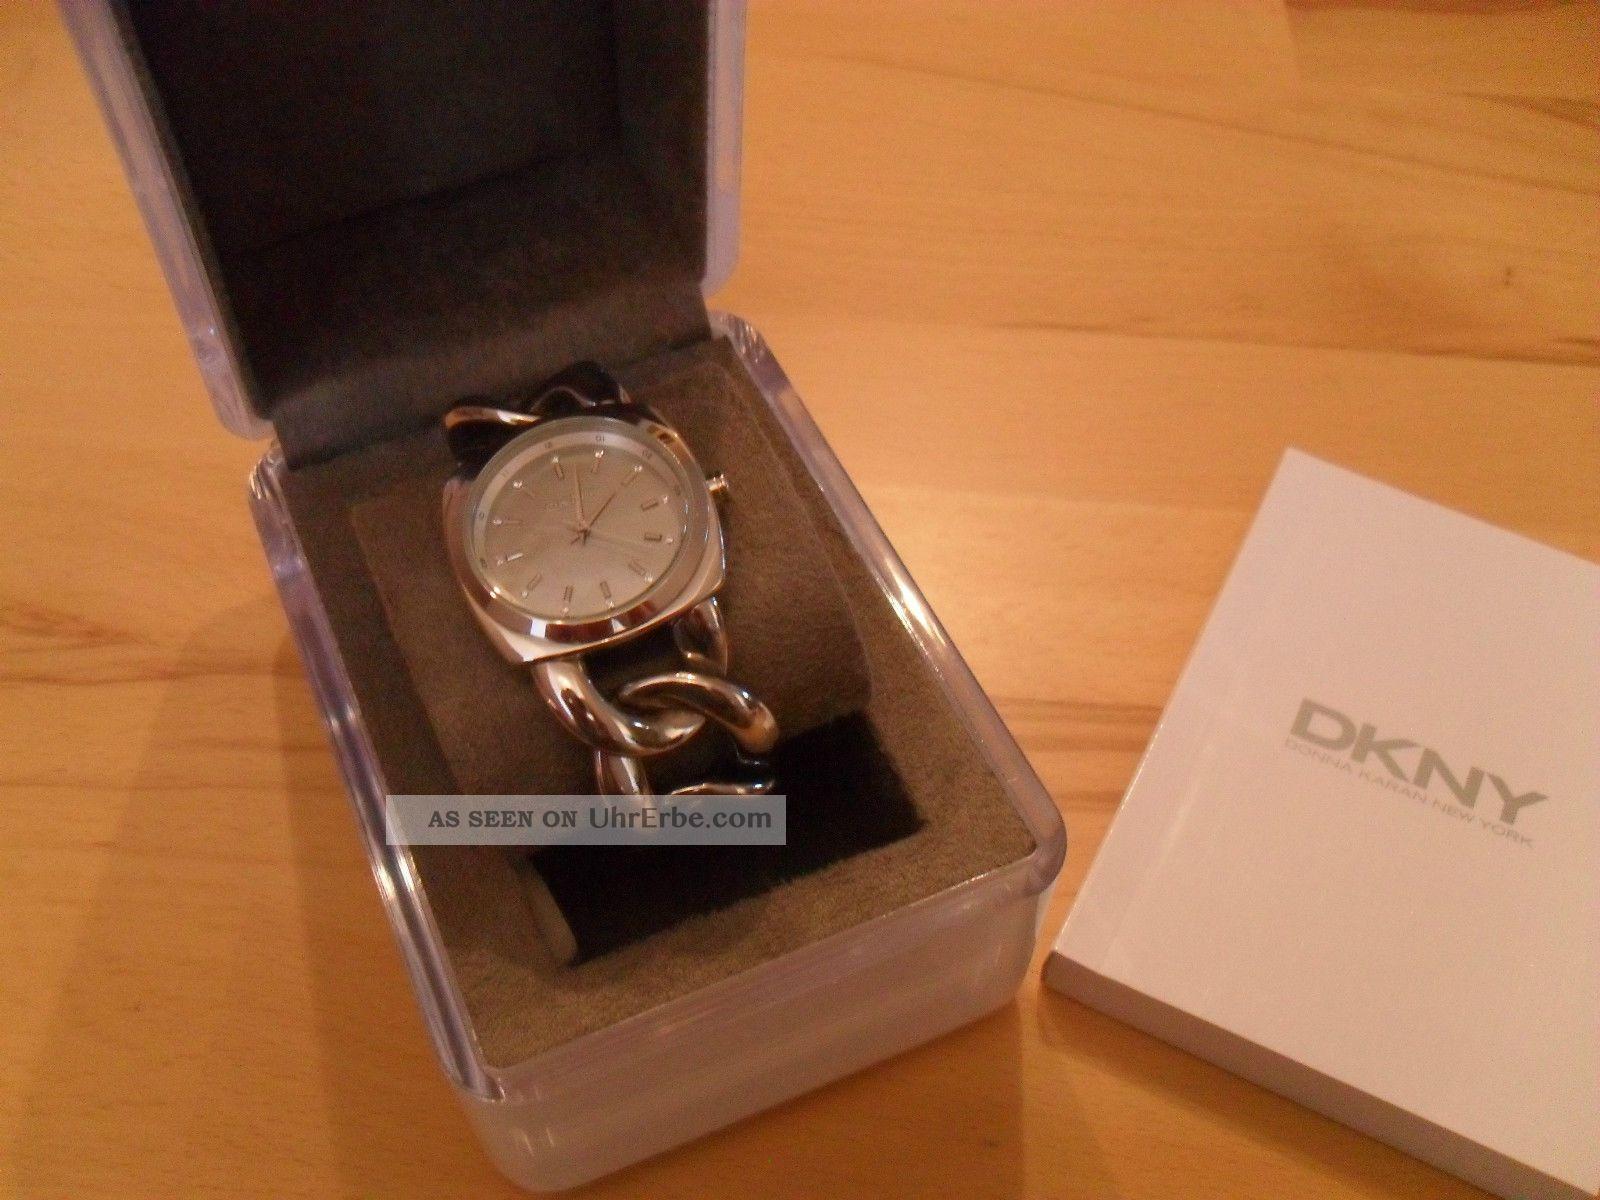 Edle Uhr Von Dkny; Es4840,  Glieder - Optik,  Perlmutt,  Edelstahl,  Np 119€,  Neuw. Armbanduhren Bild